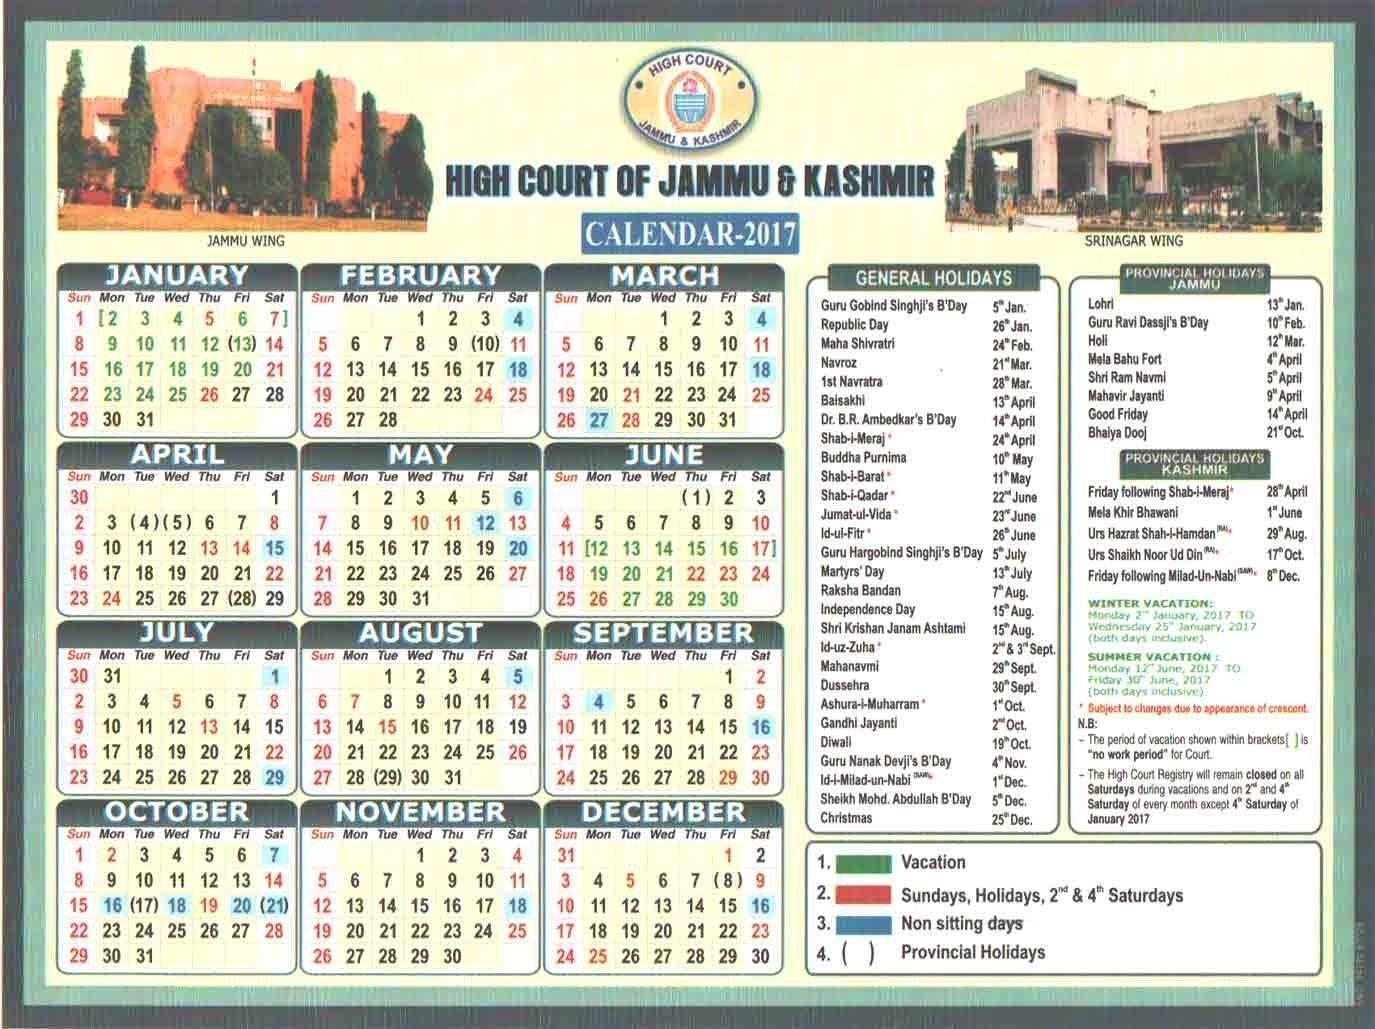 J&k State Holidays Calendar 2019 • Printable Blank Calendar Template J&k Calendar 2019